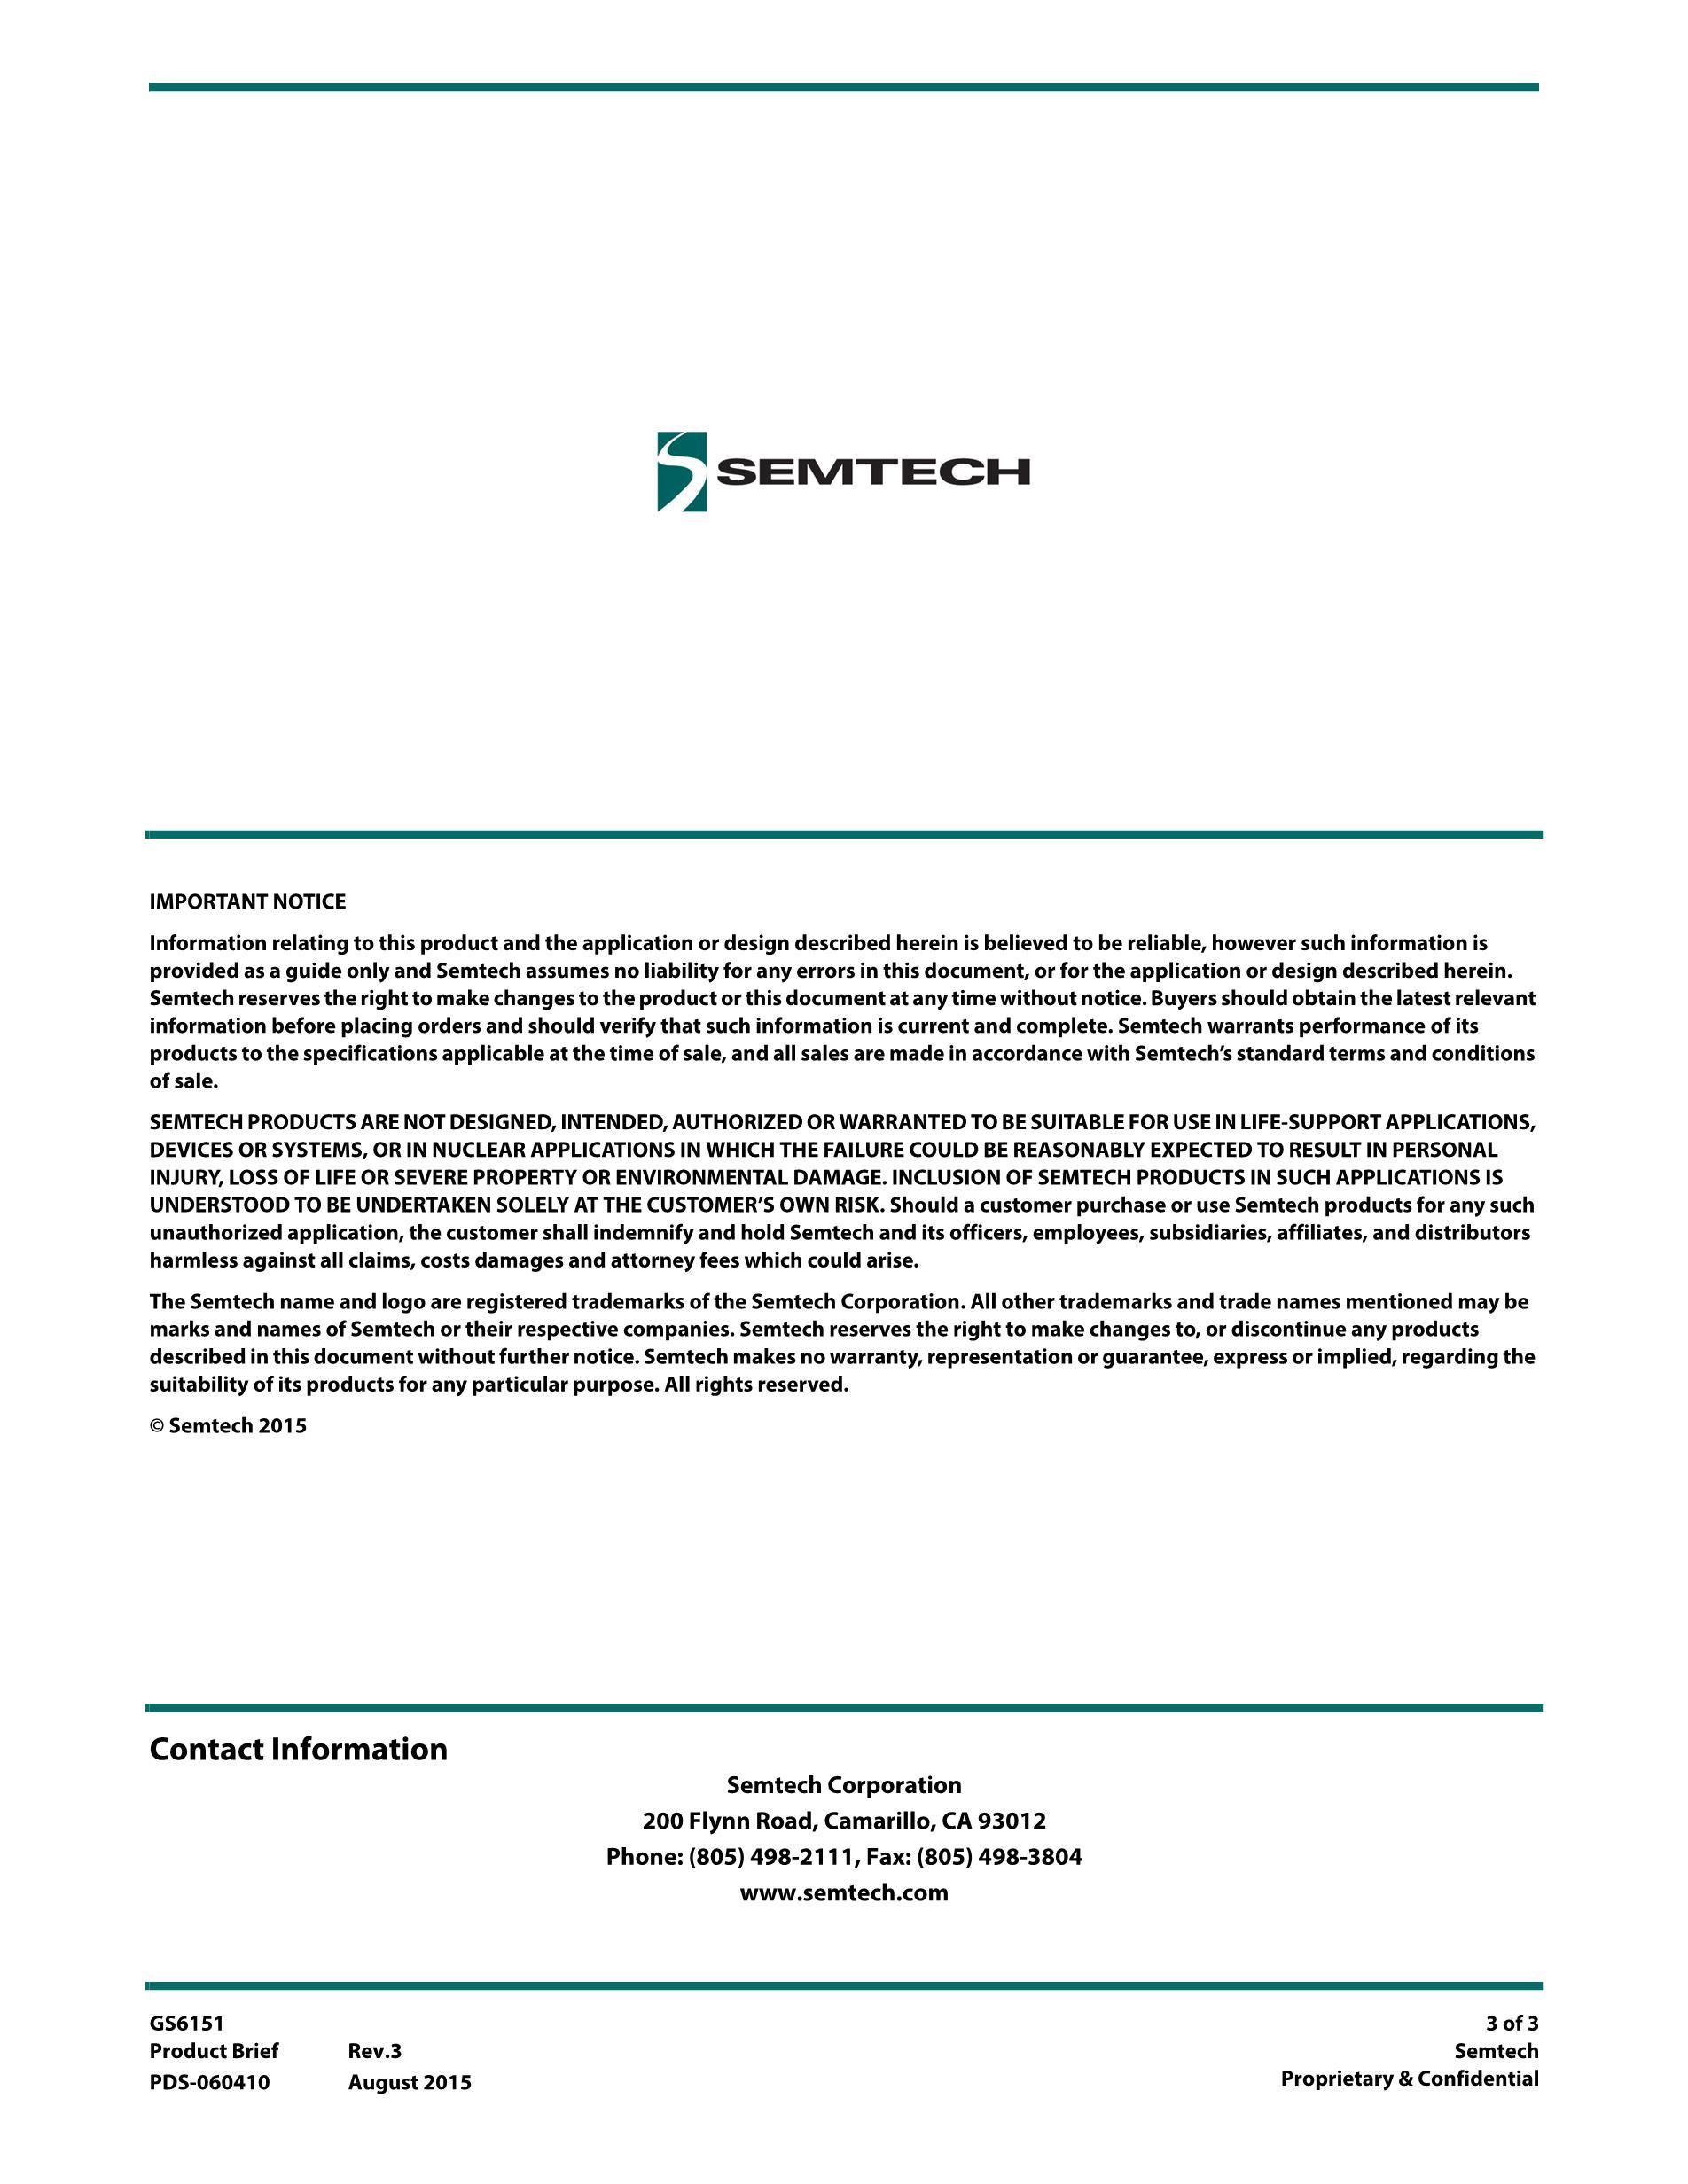 Intersil(Renesas Electronics) ISL33003IUZ's pdf picture 3